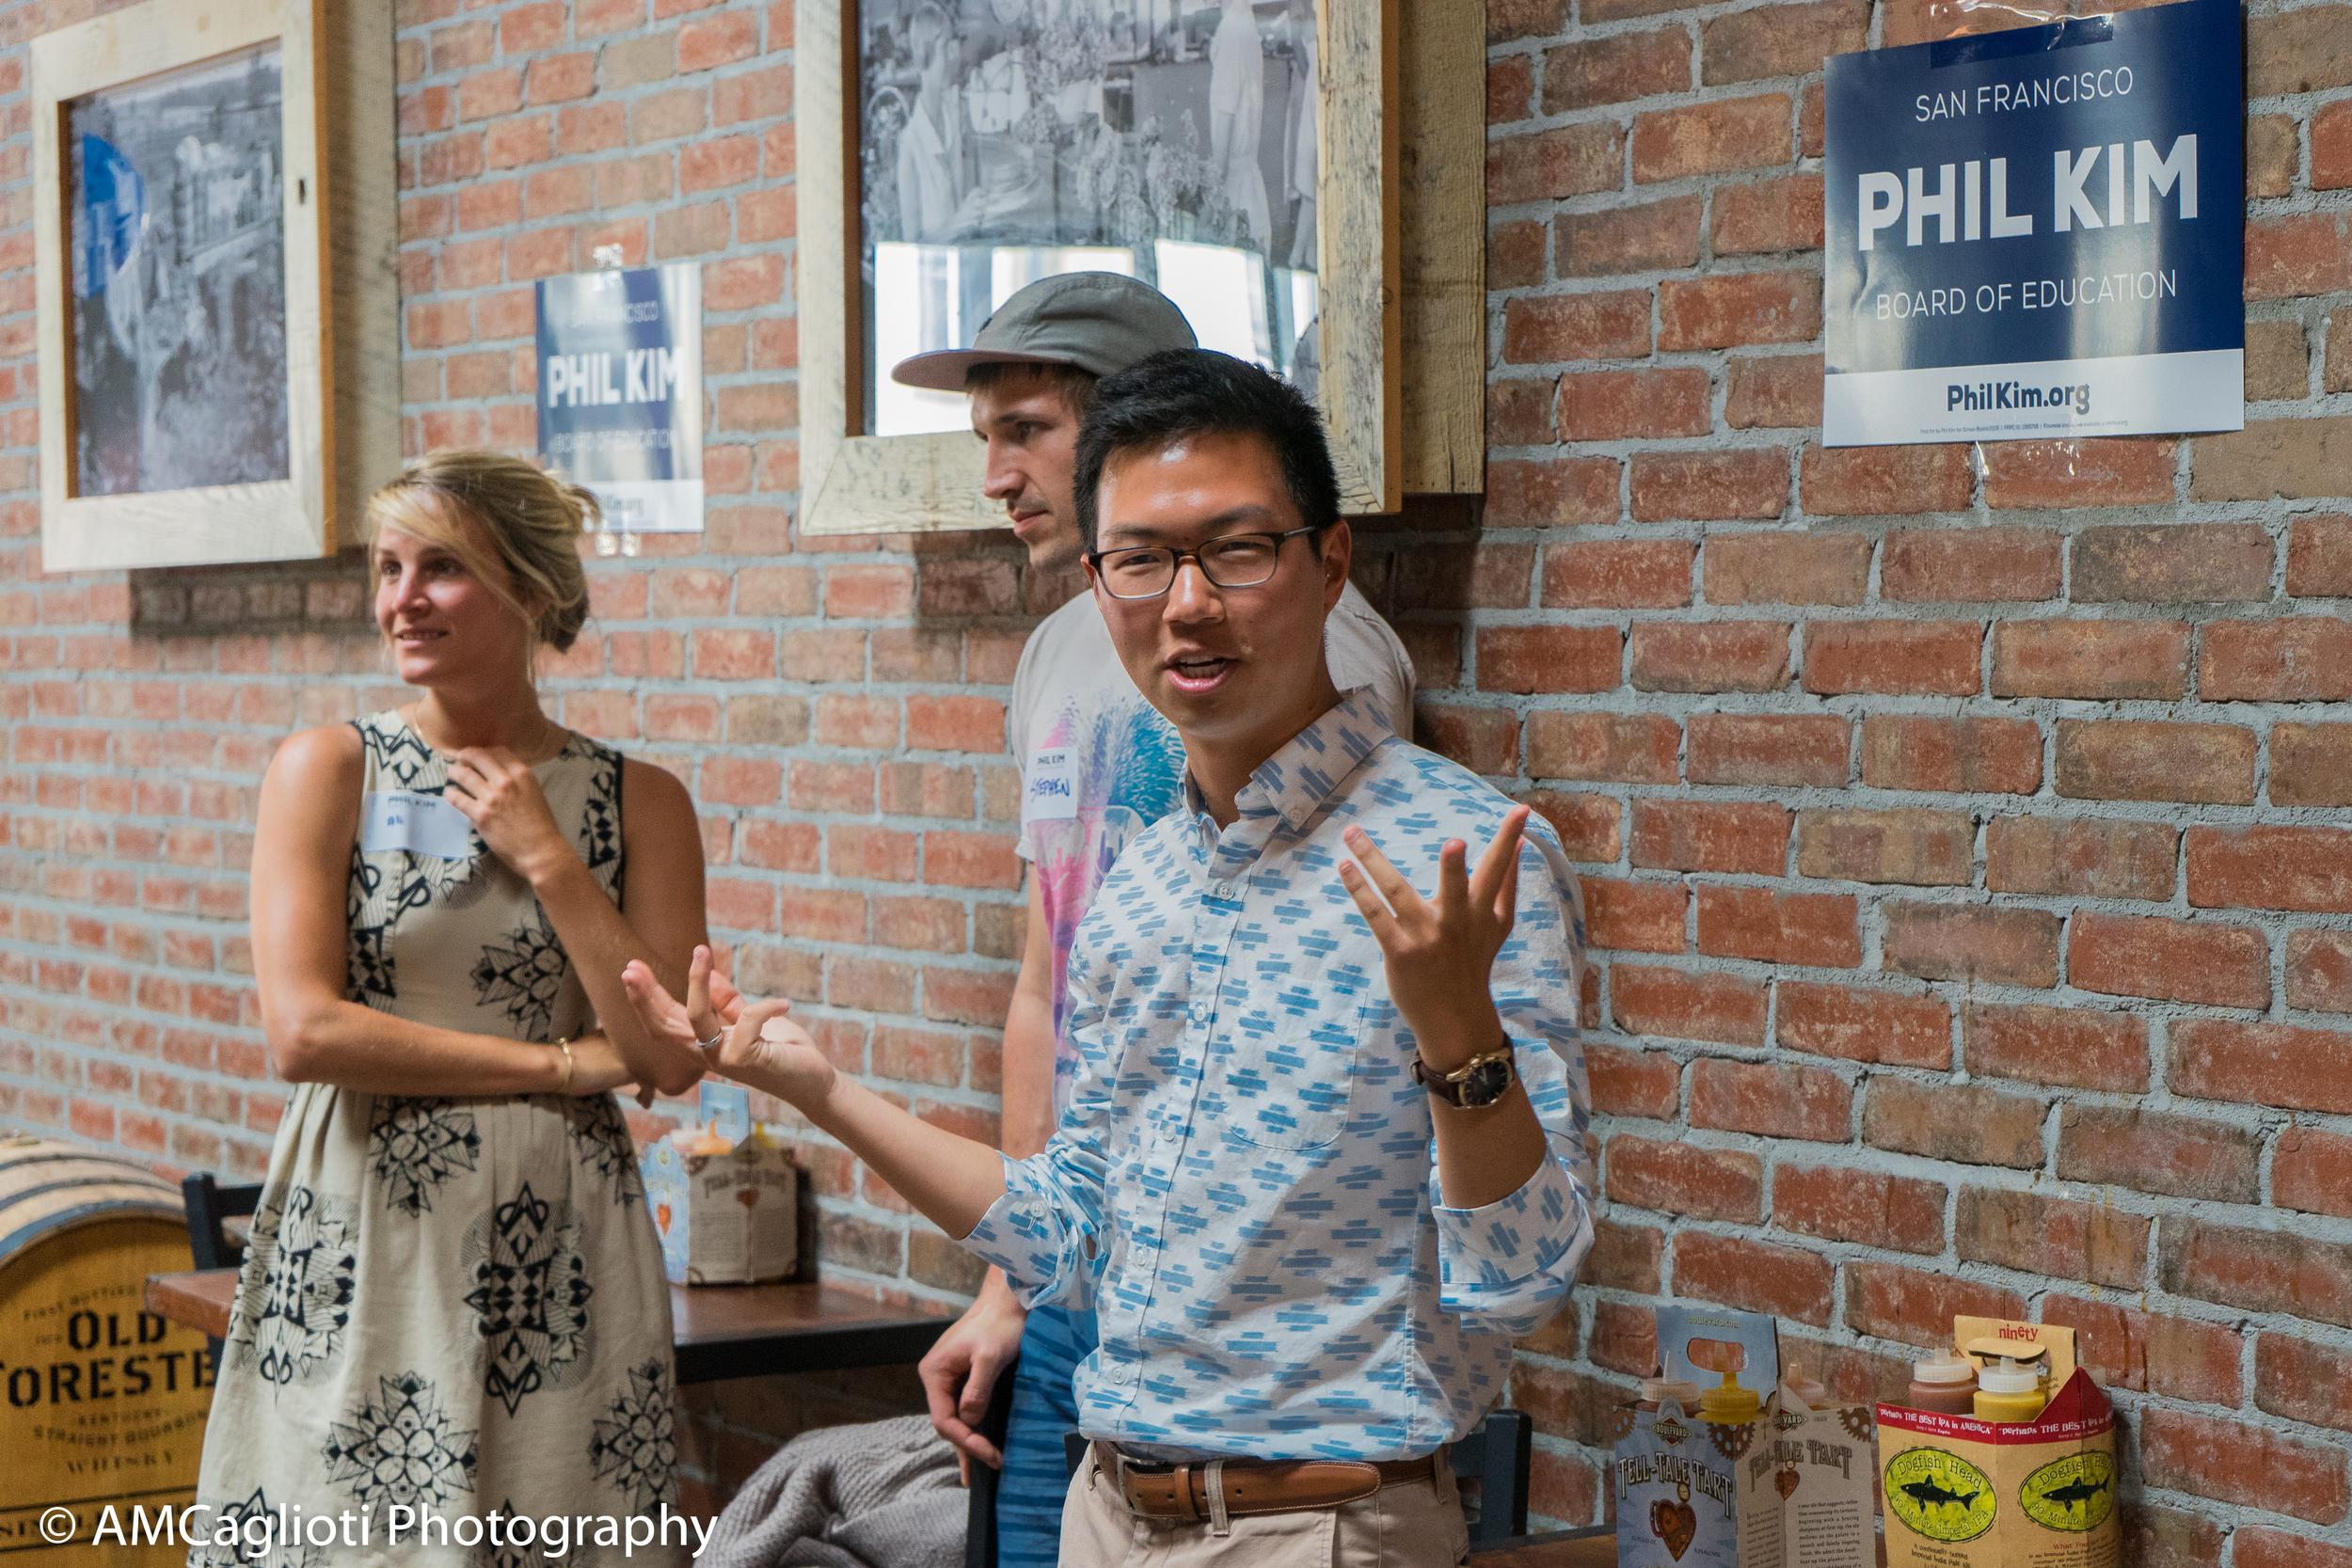 Phil Kim Campaign (21 of 50).jpg